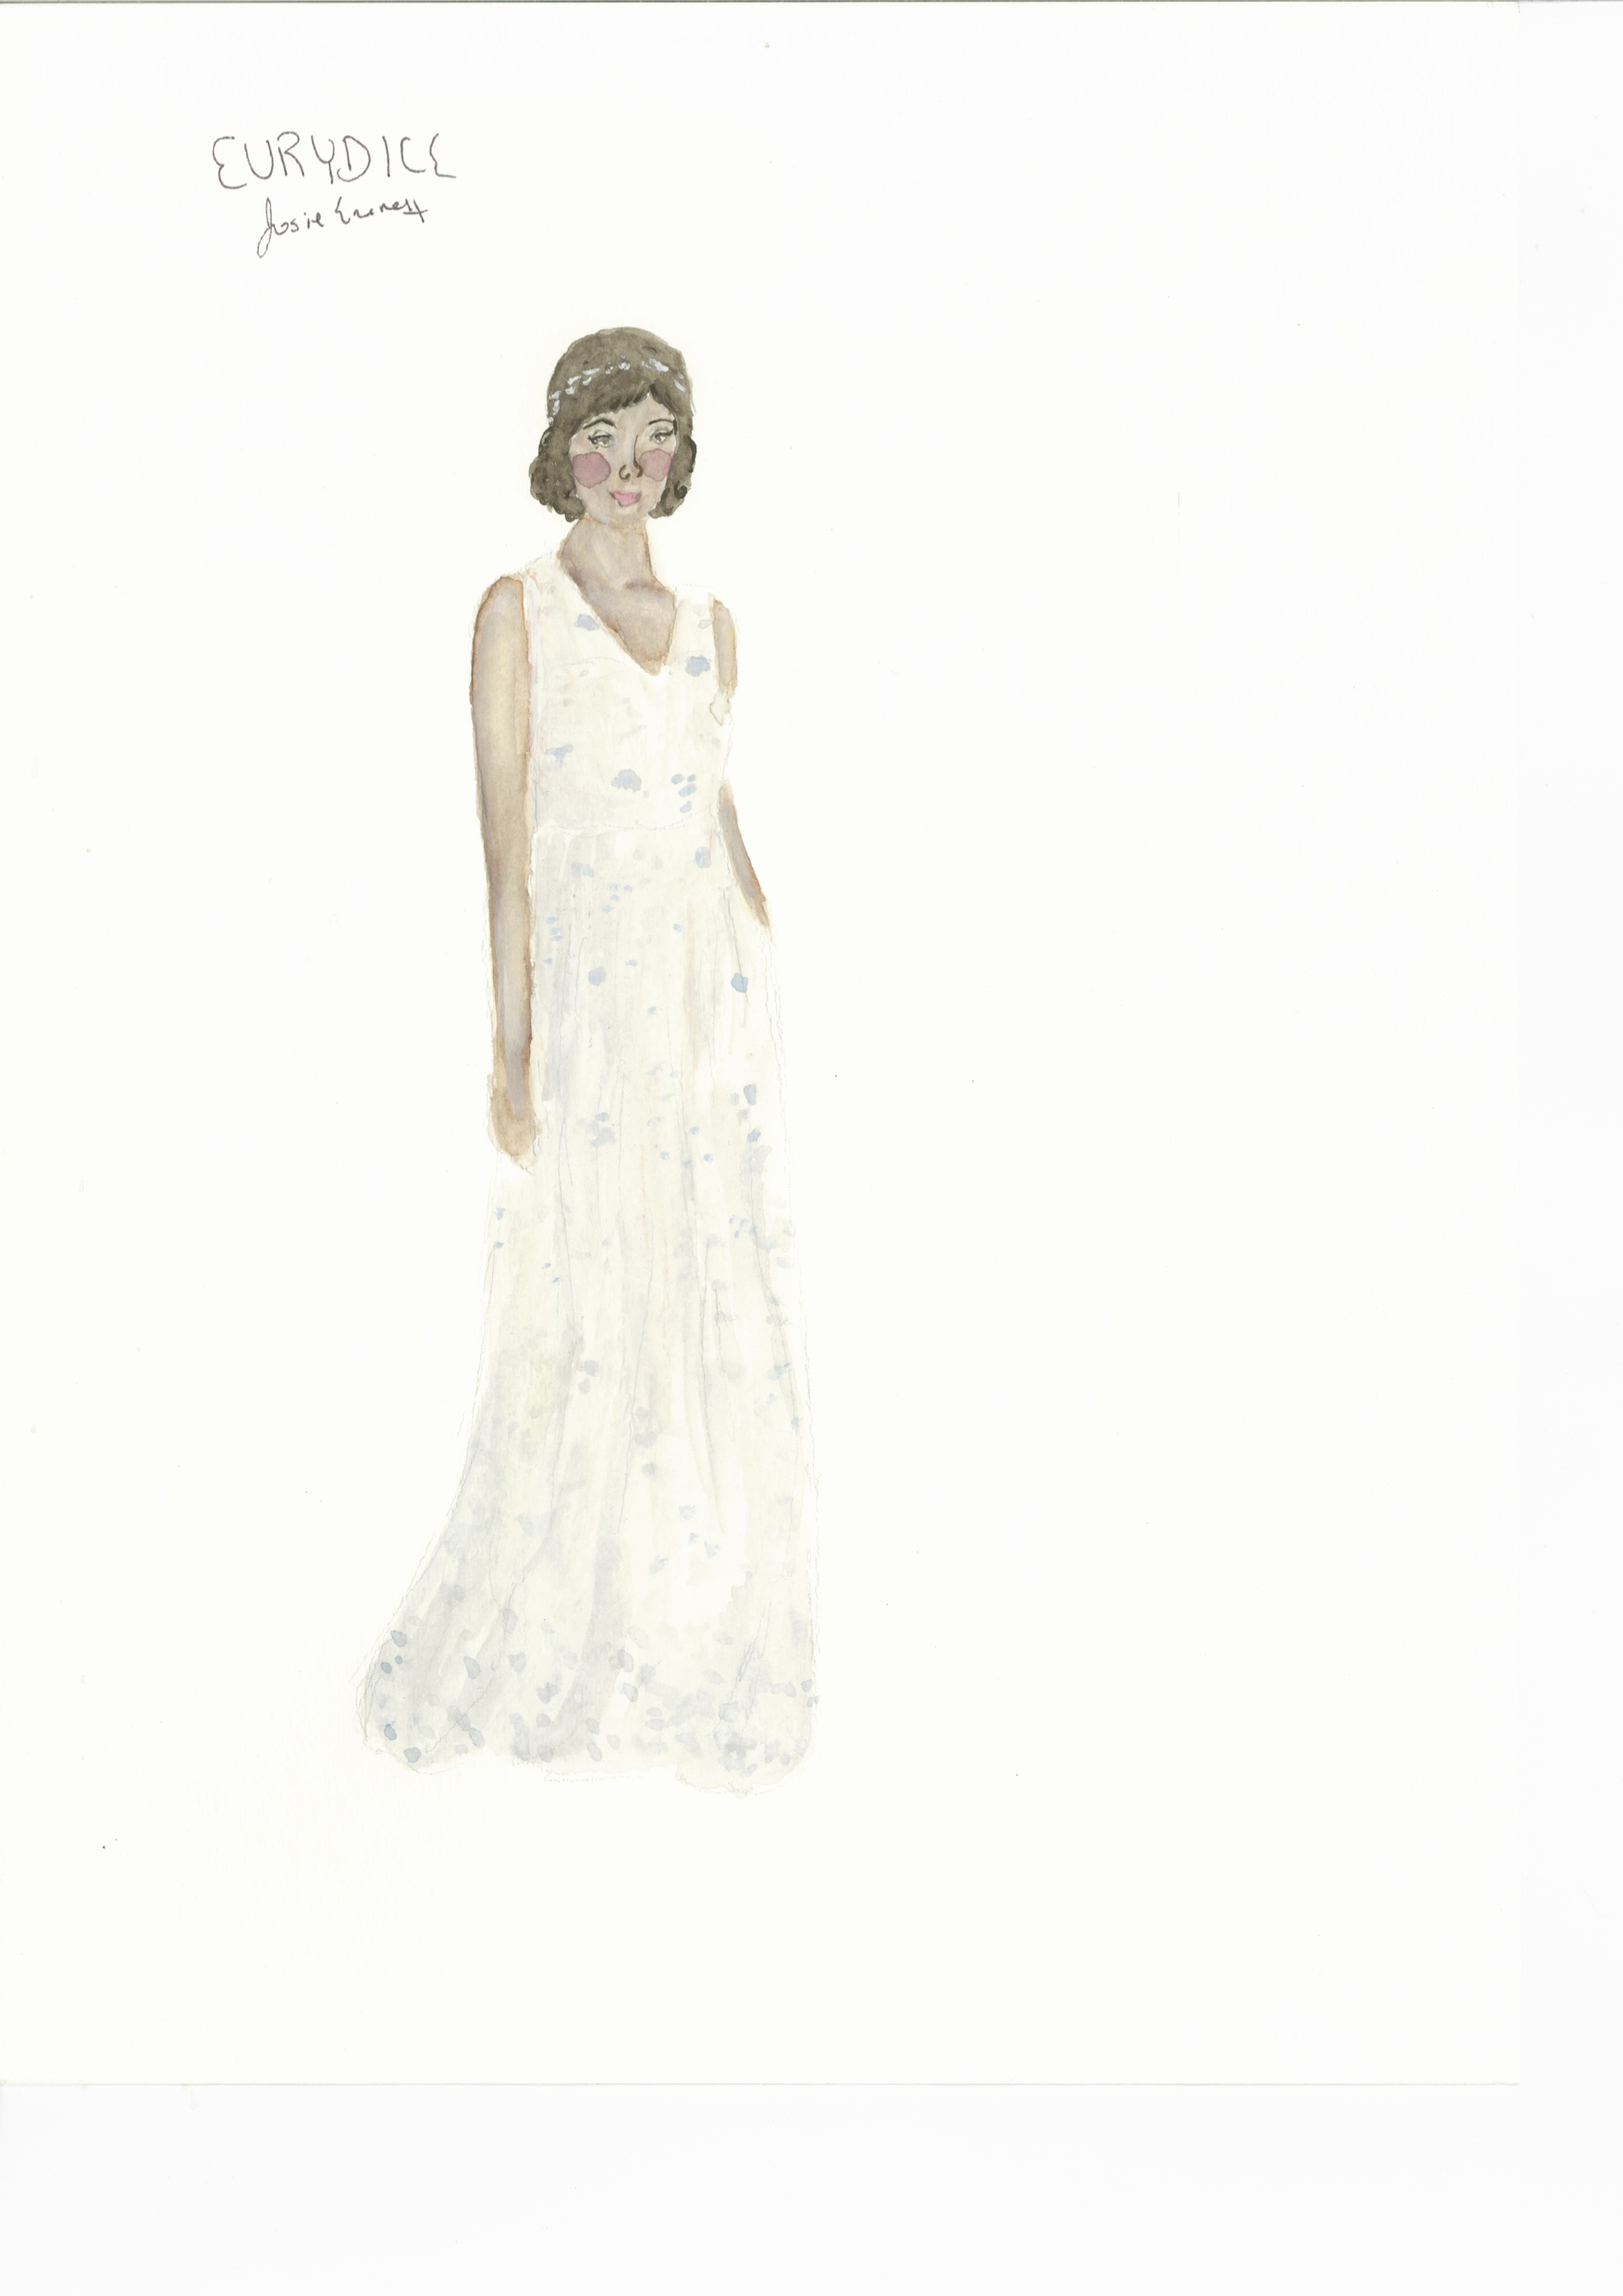 Eurydice - Wedding Day